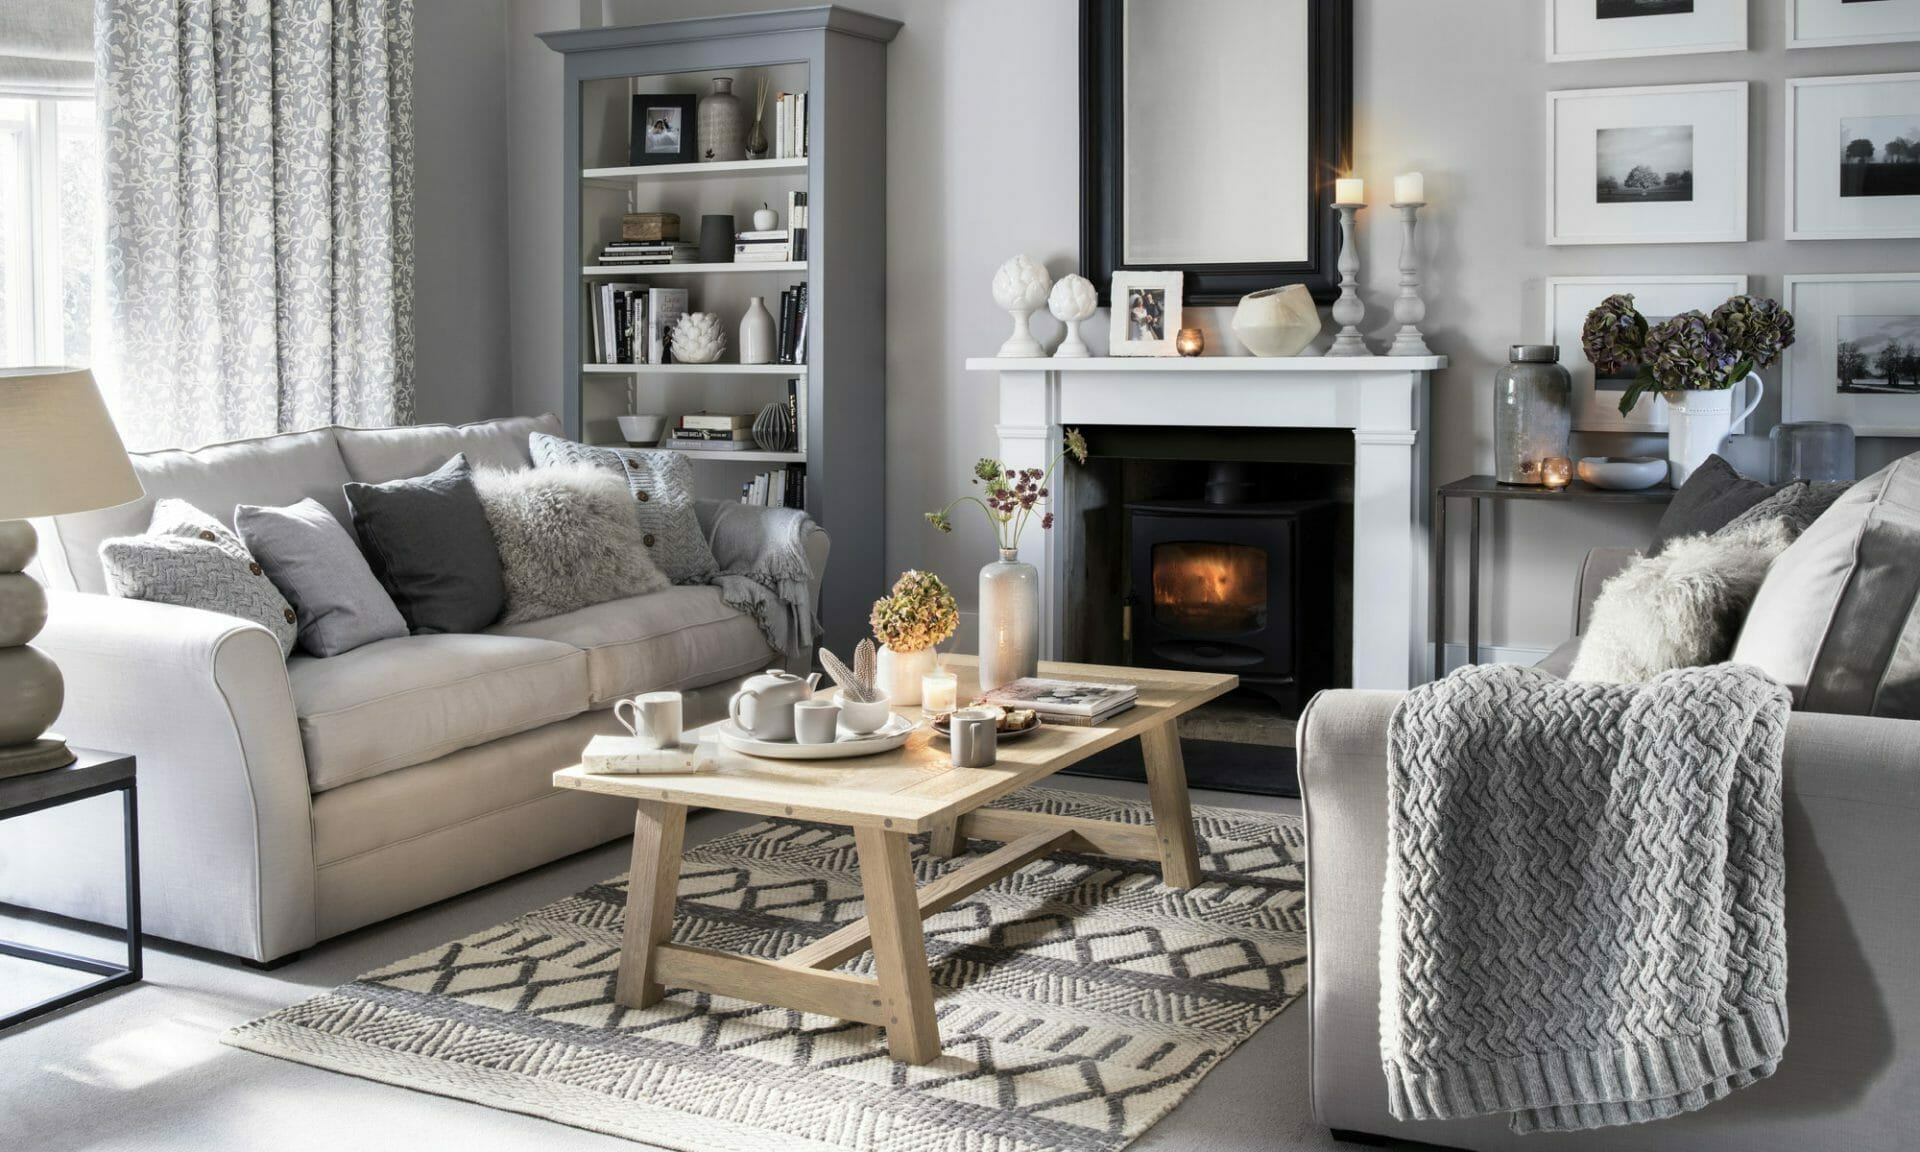 Cozy neutral gray living room winter decor ideas